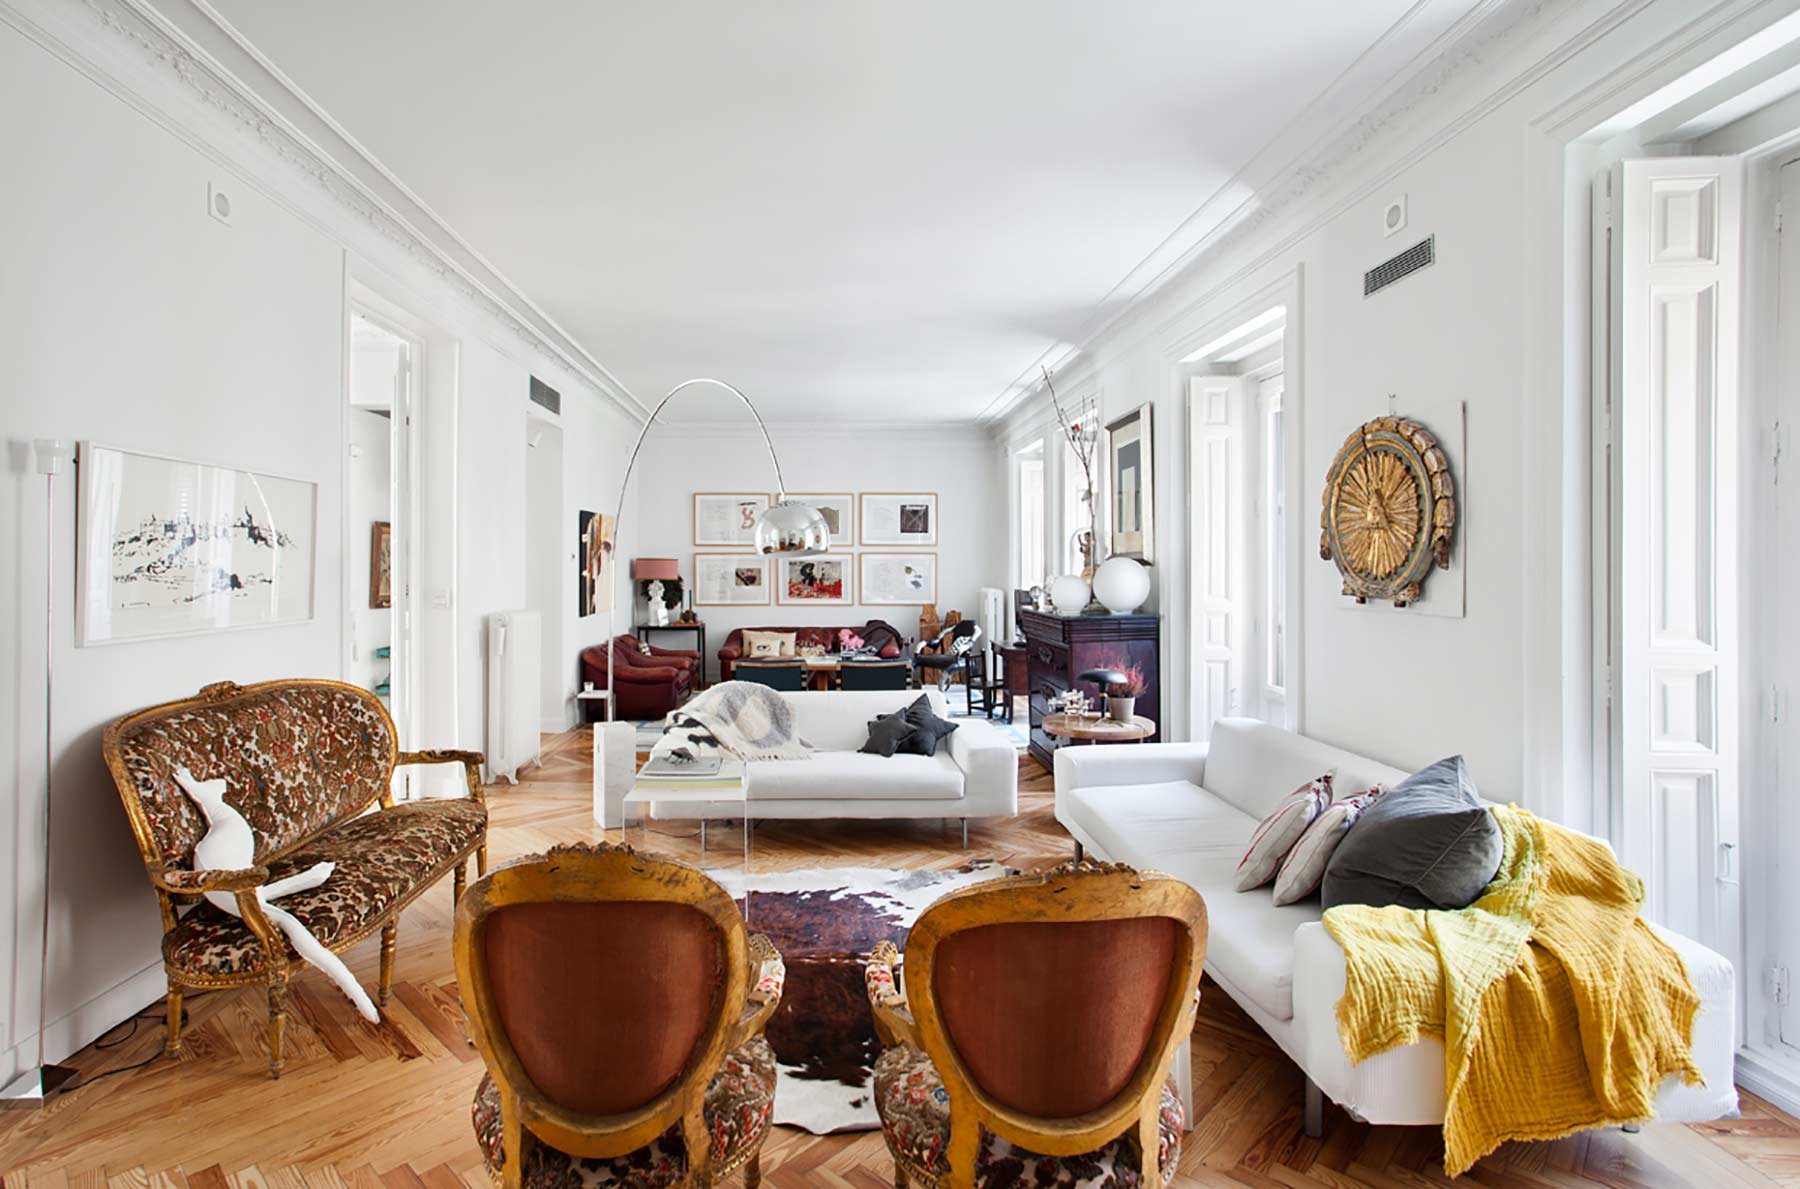 Madrid - Espagne - Appartement , 4 pièces, 4 chambres - Slideshow Picture 2